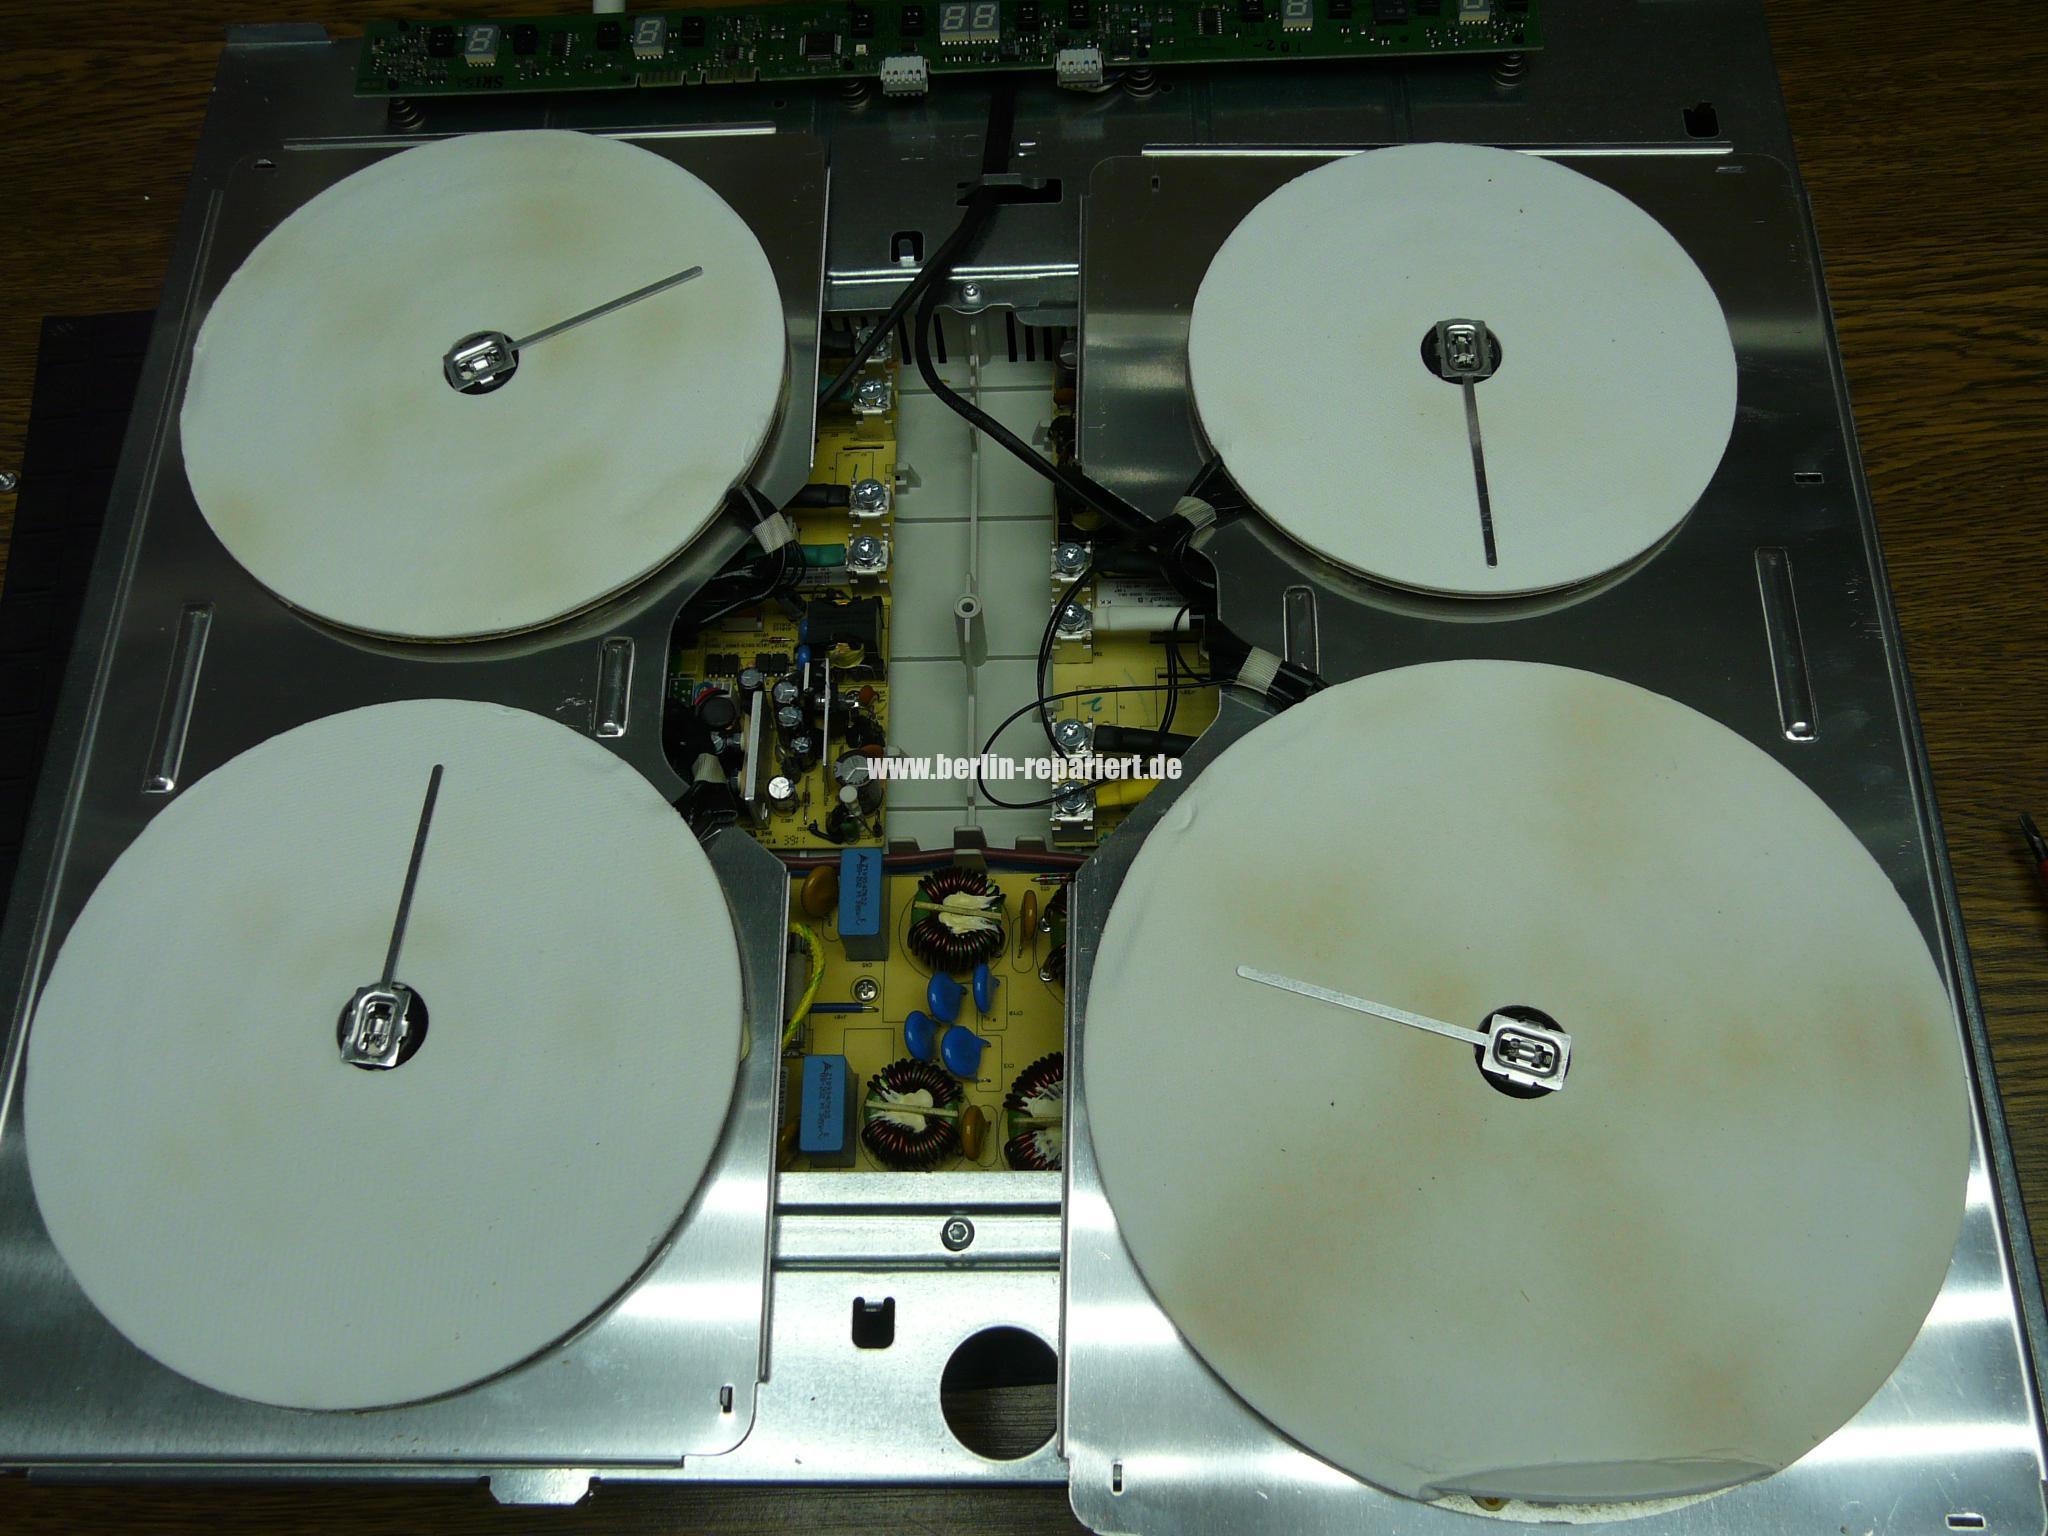 Whirlpool Hah 7000 Bb Induktion Kochfeld Fehlermeldung F47 Atlas